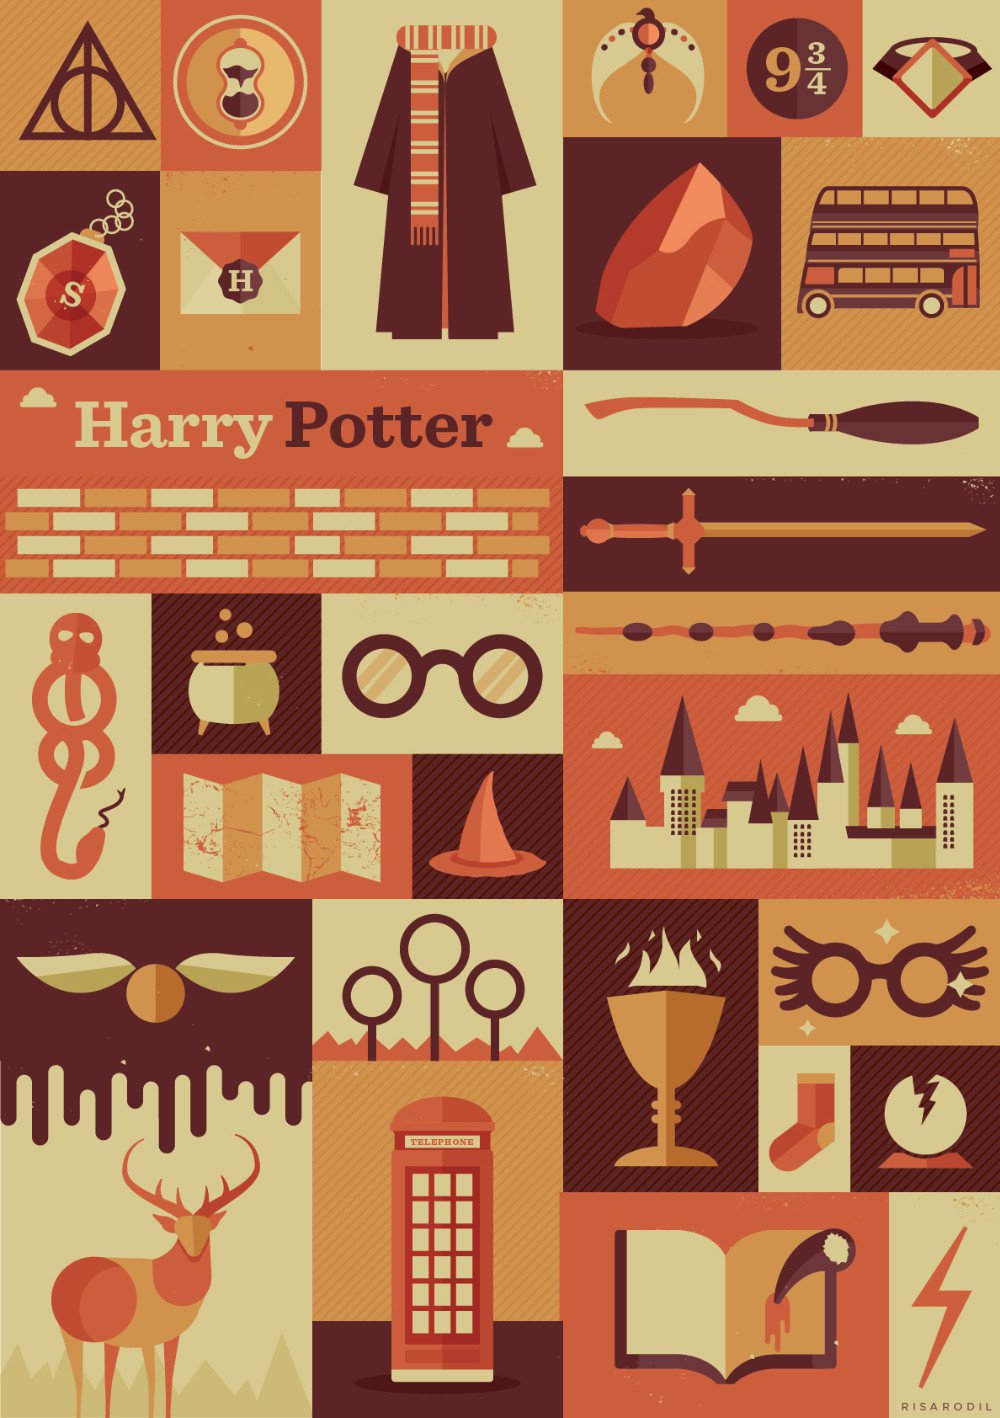 Harry Potter Retro Vintage Poster # 1